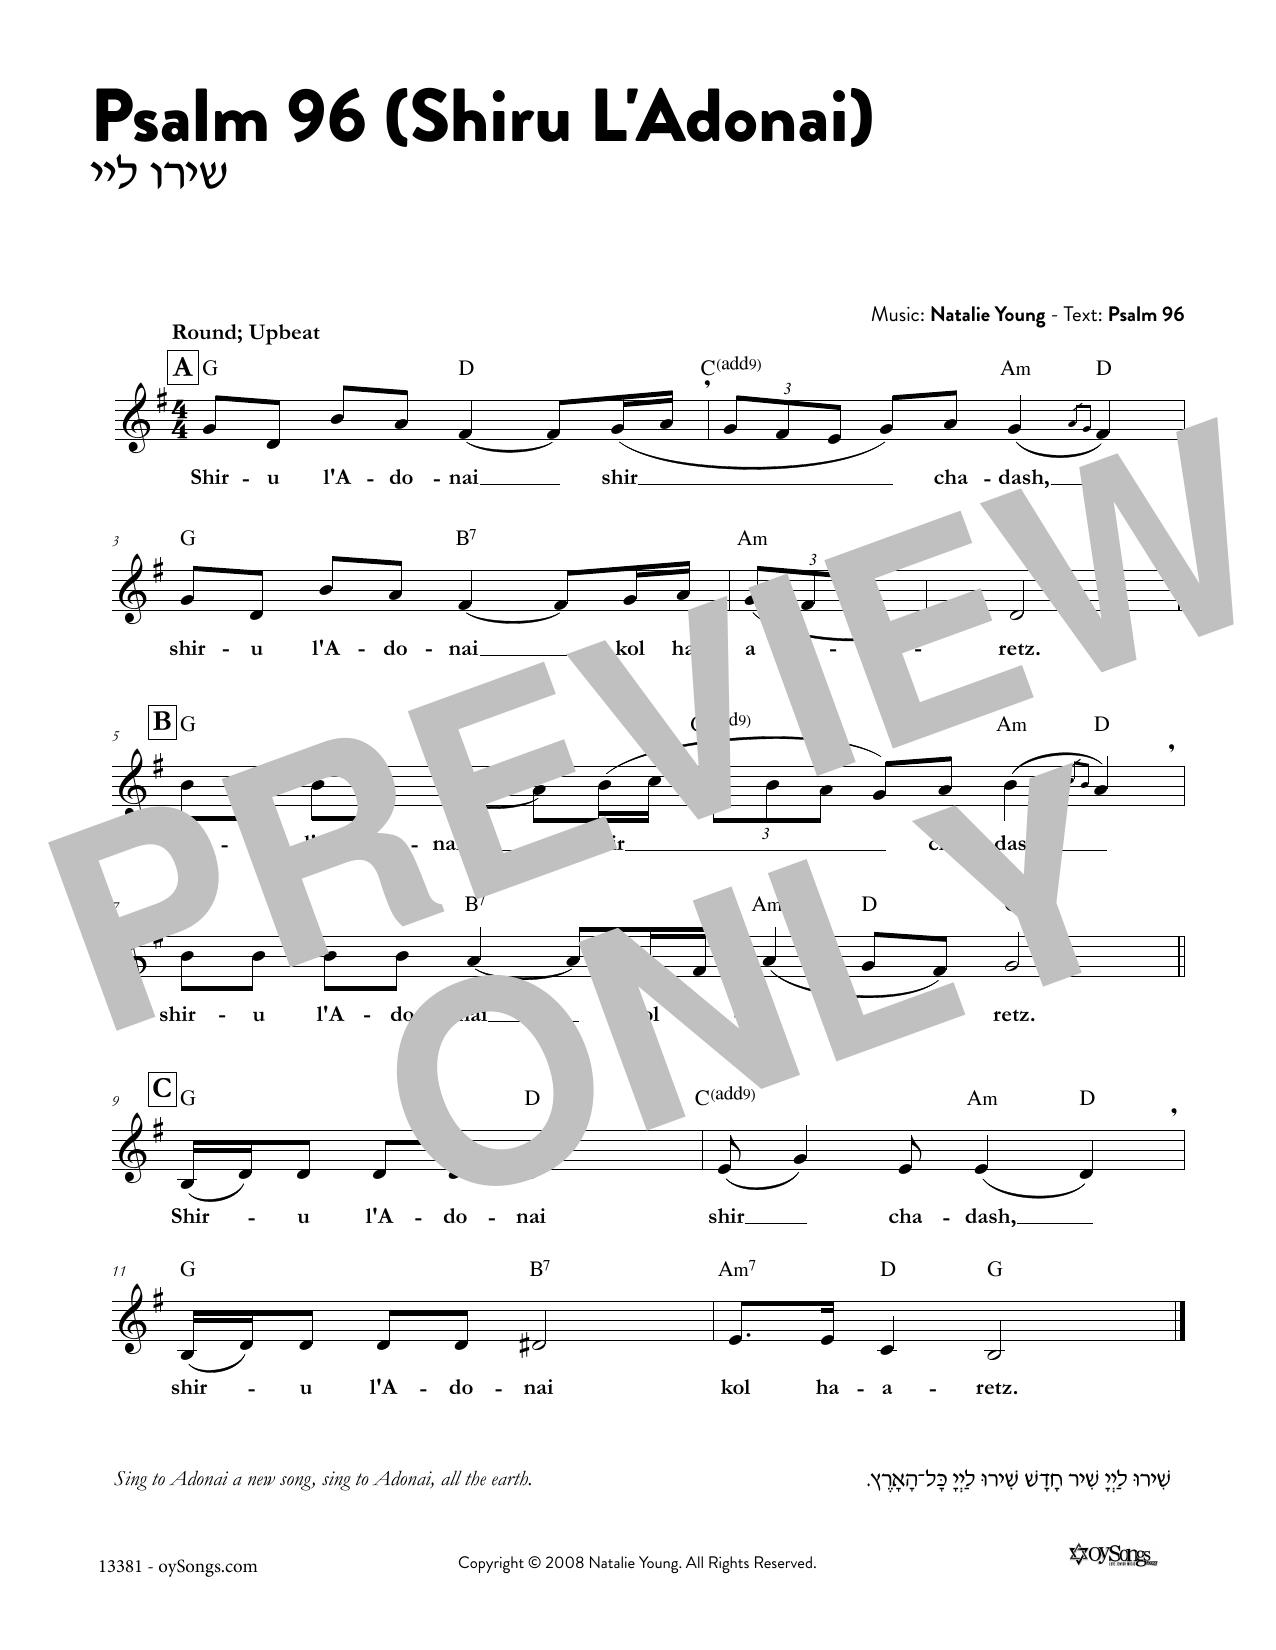 Psalm 96 - Shiru L'Adonai Sheet Music